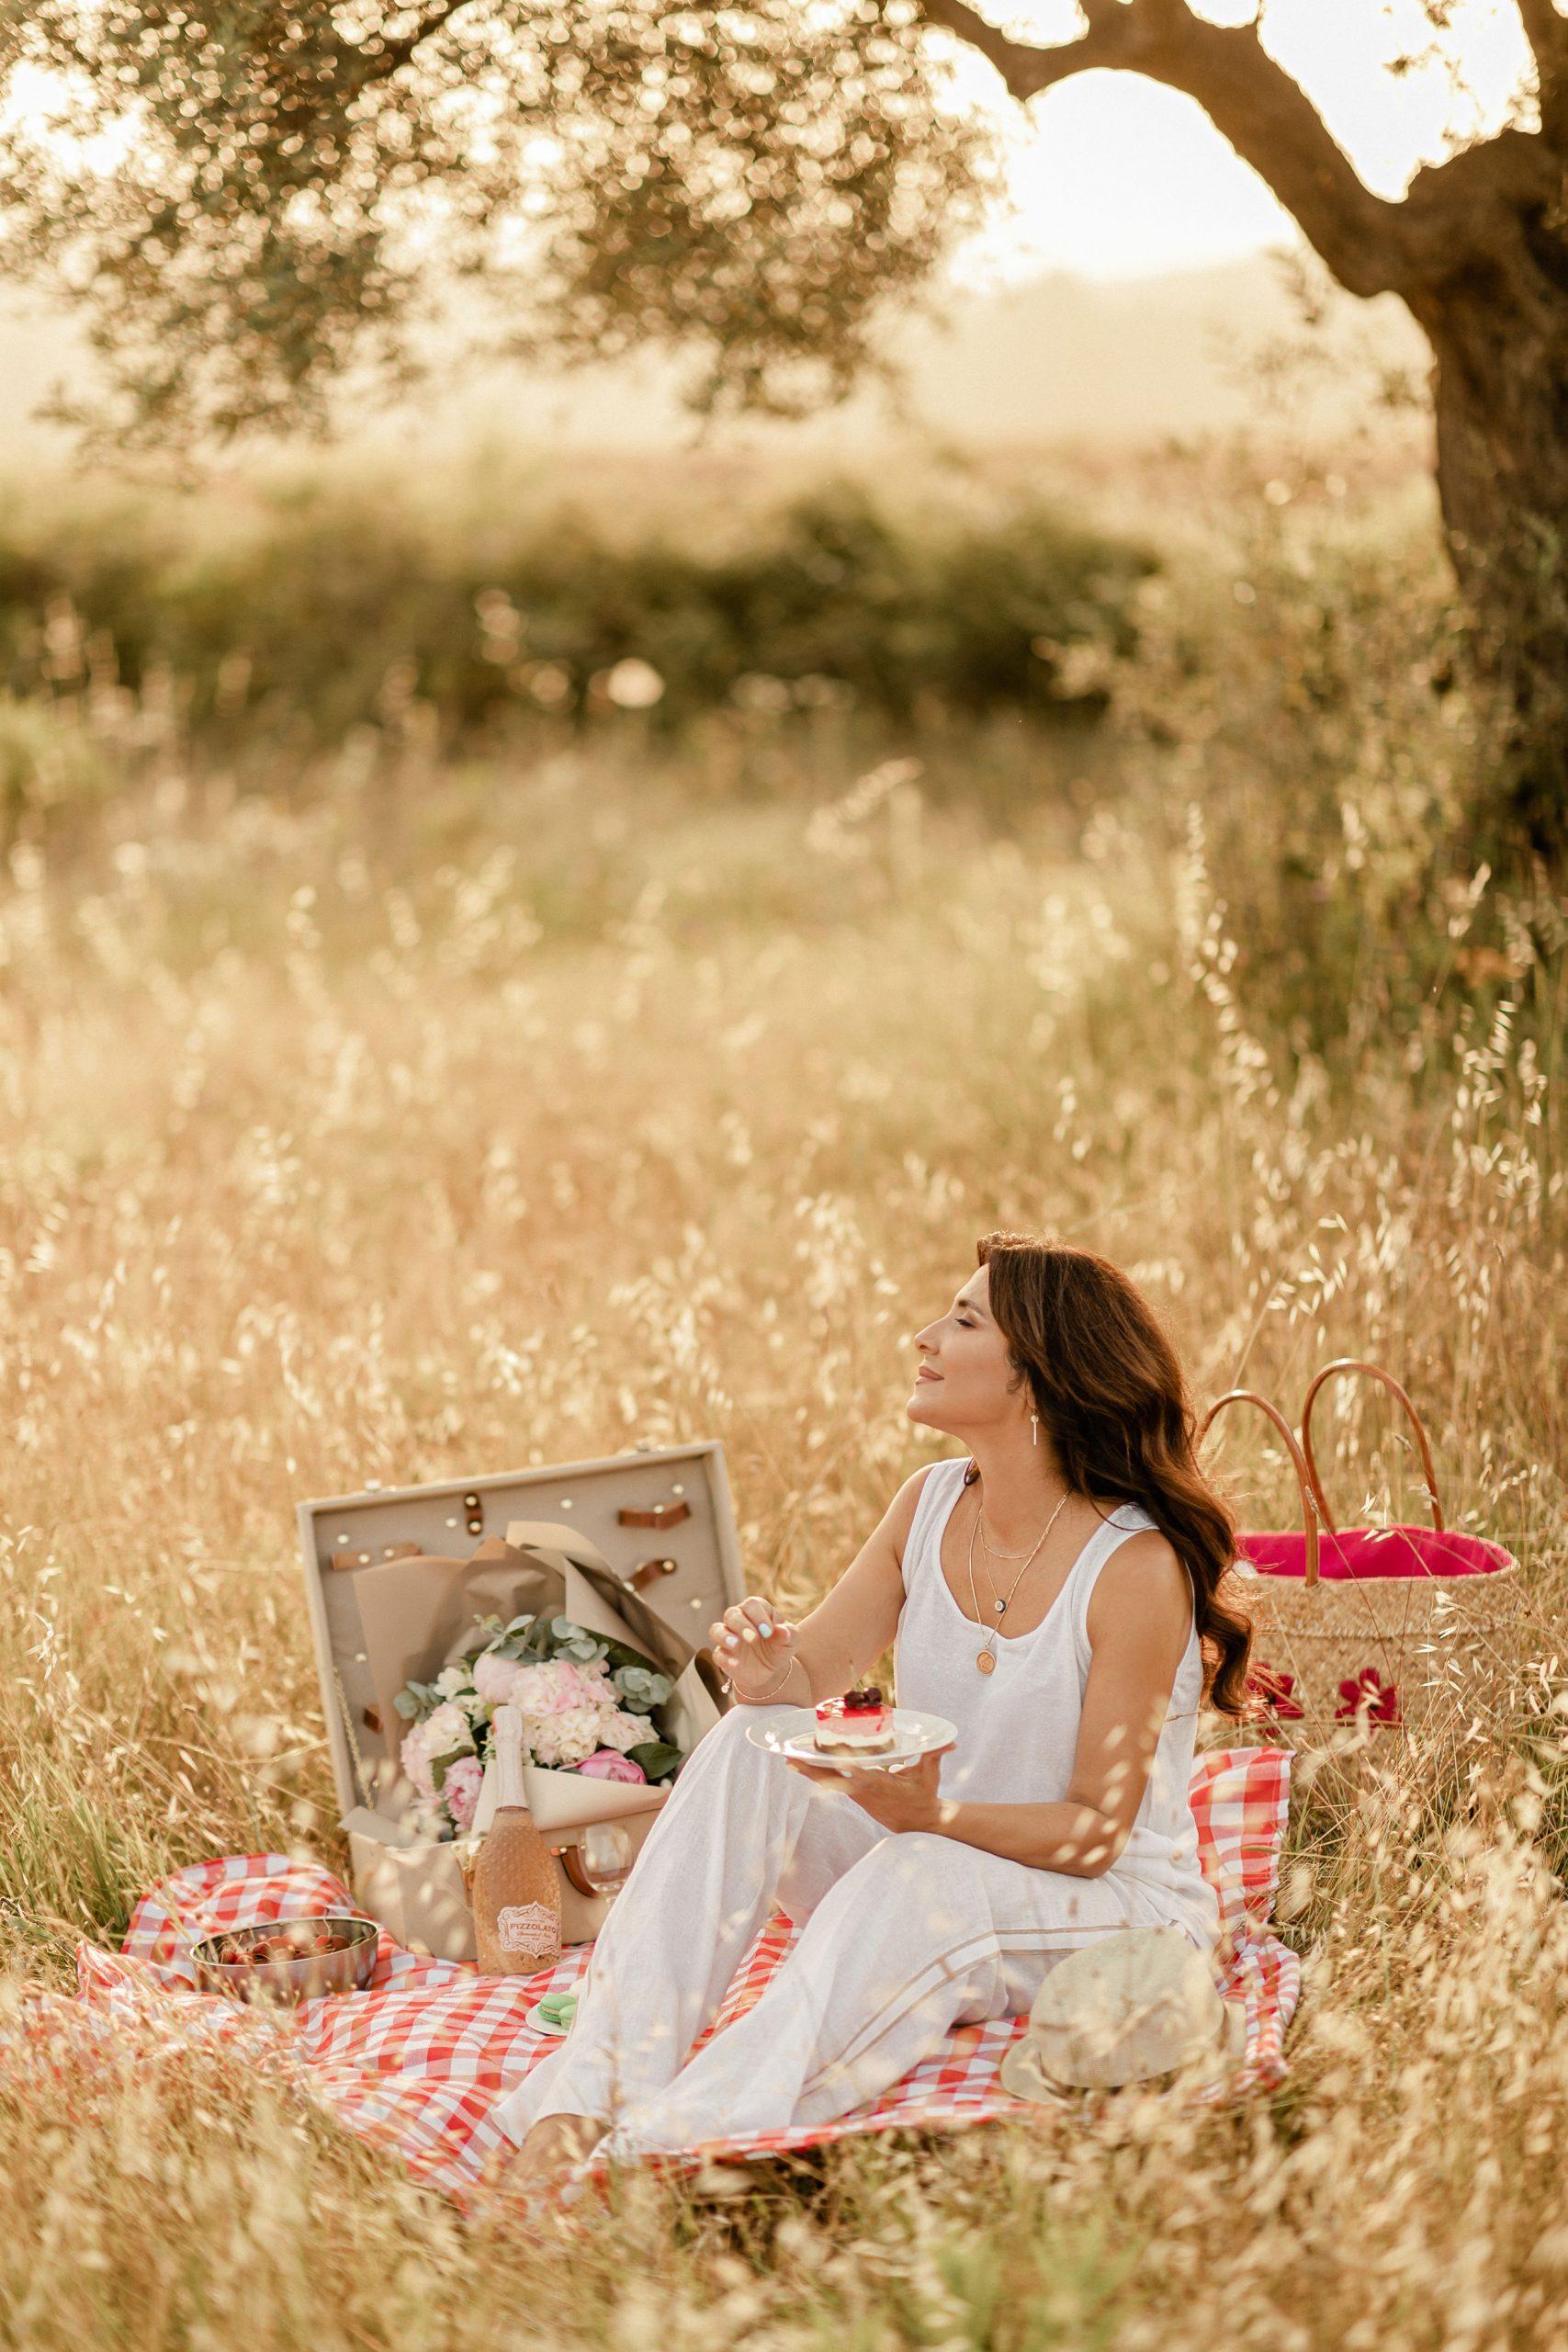 Iva Tico enjoying nature and the fresh air